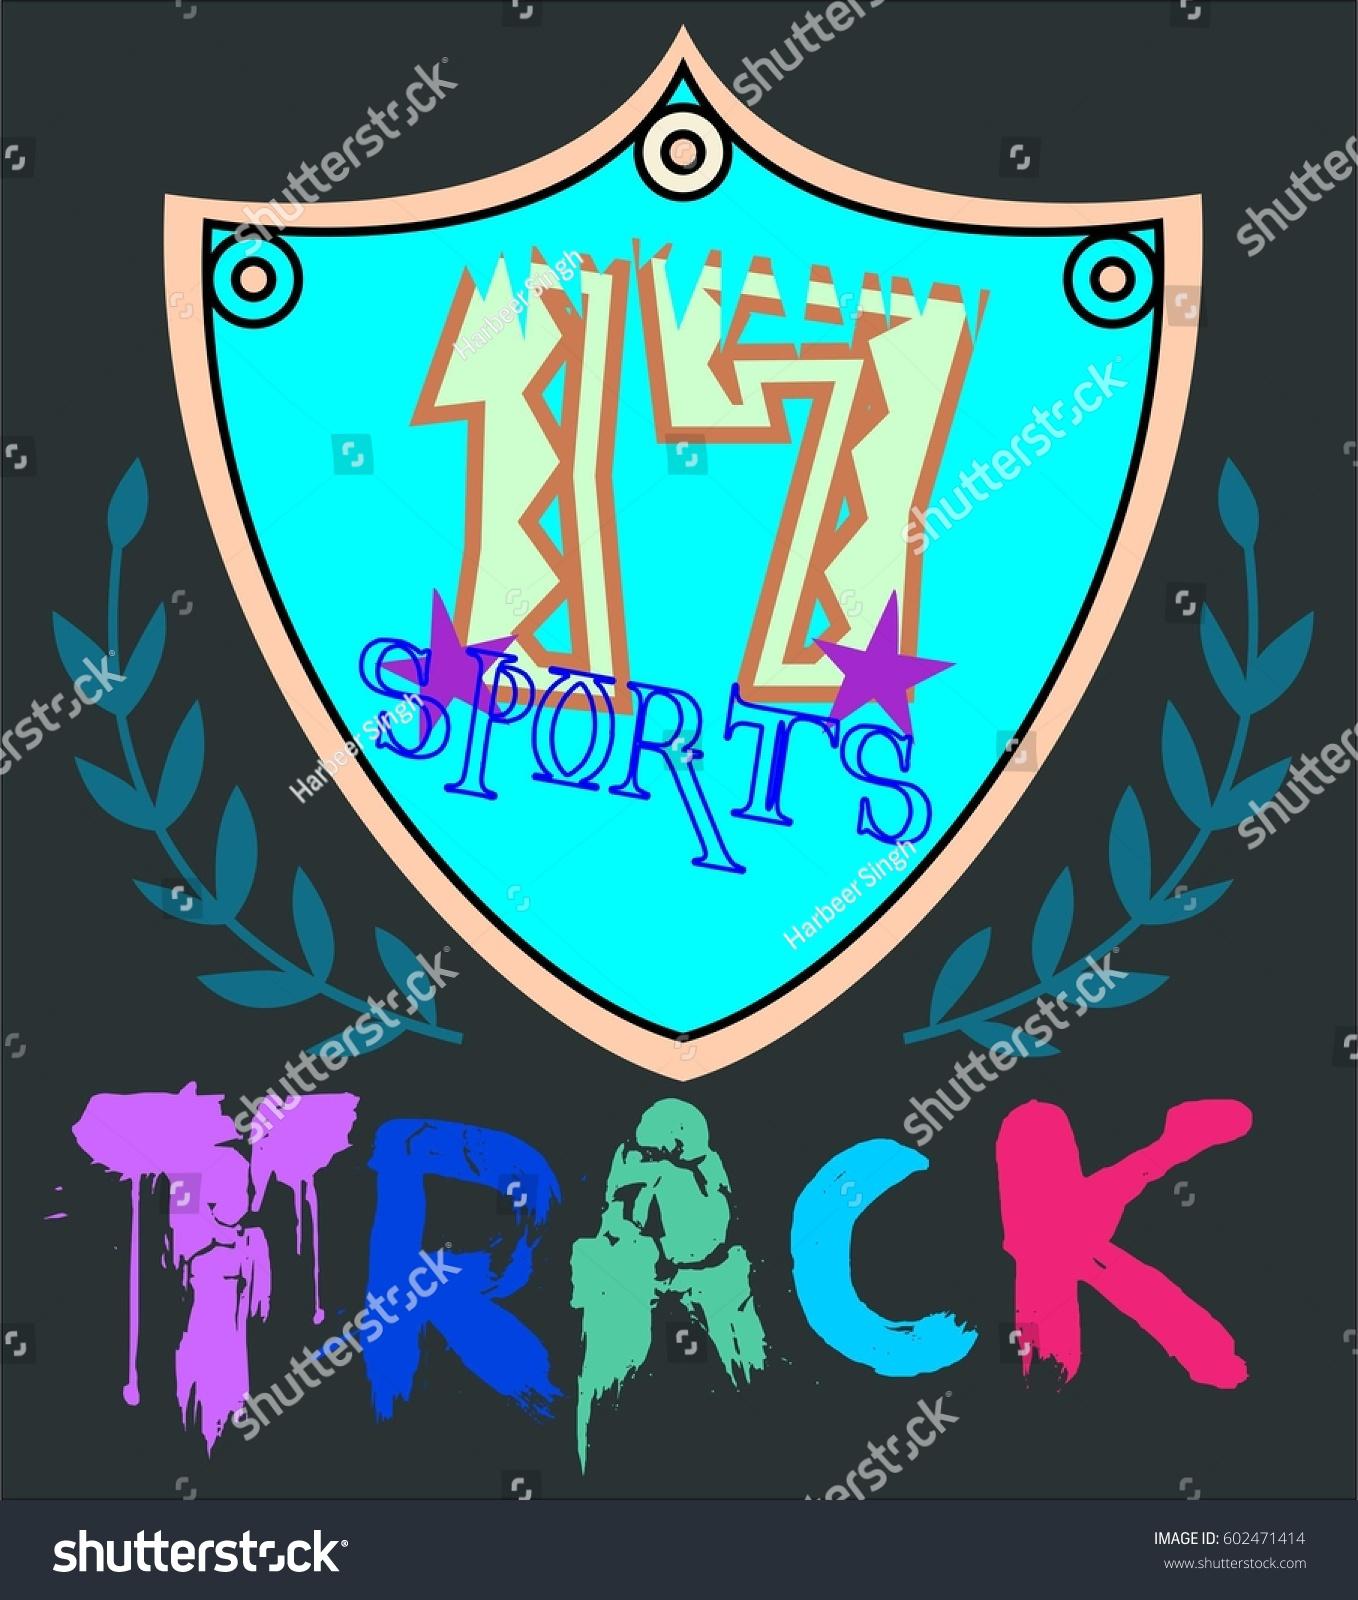 Track Sports Vector Tshirt Design Stock Vector Royalty Free